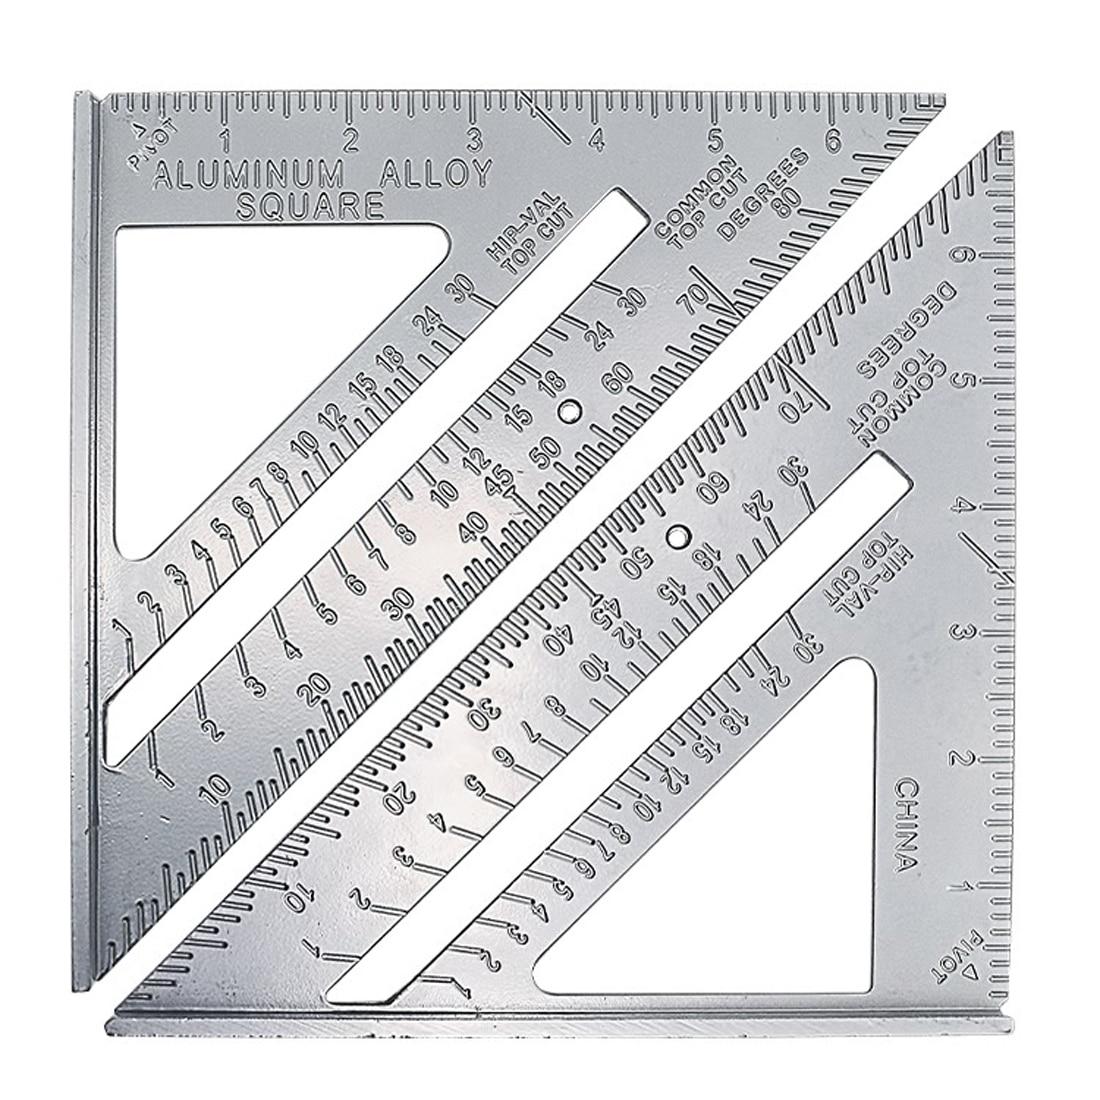 1pcs Aluminum Alloy Speed Square Protractor Miter Framing Tri-square Line Scriber Saw Guide Square Carpenter Ruler Measurement